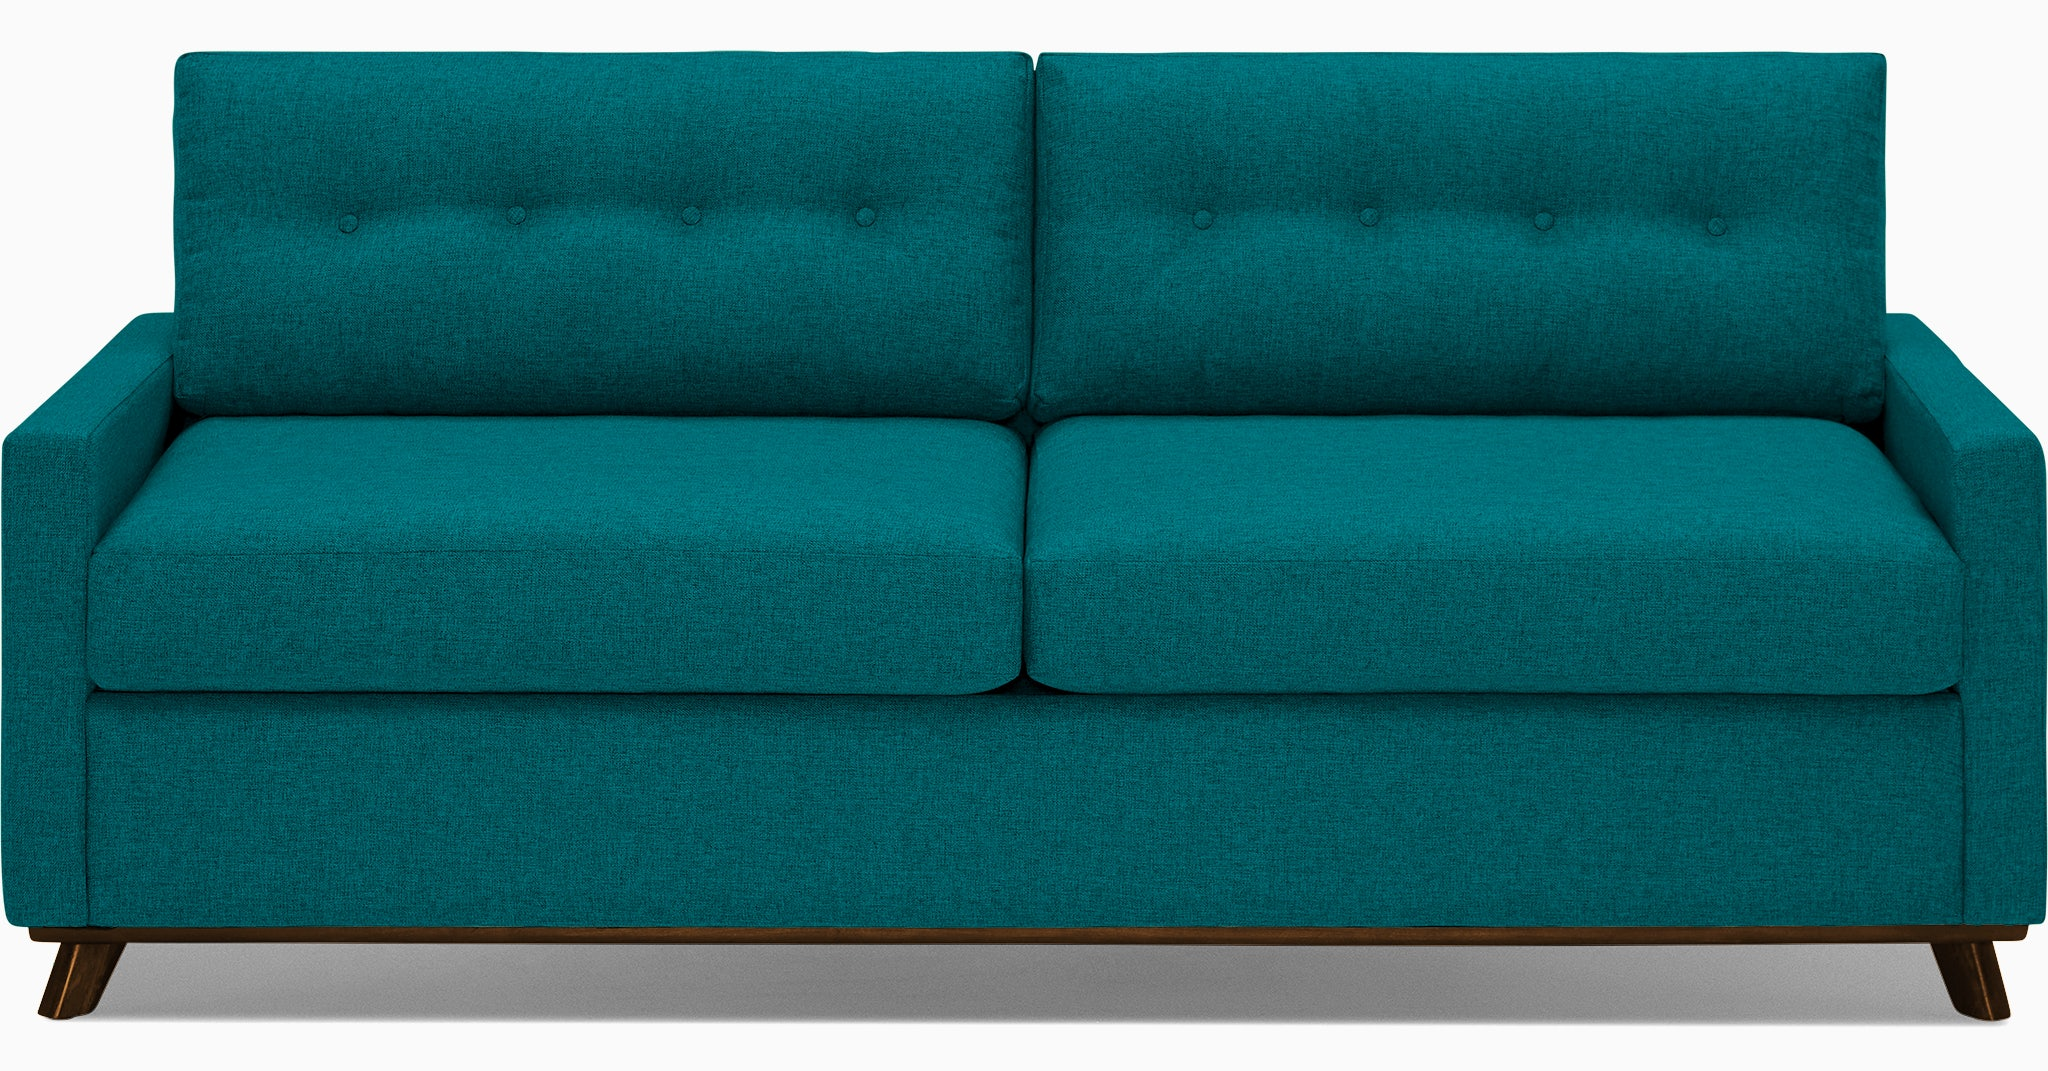 hopson sleeper sofa lucky turquoise